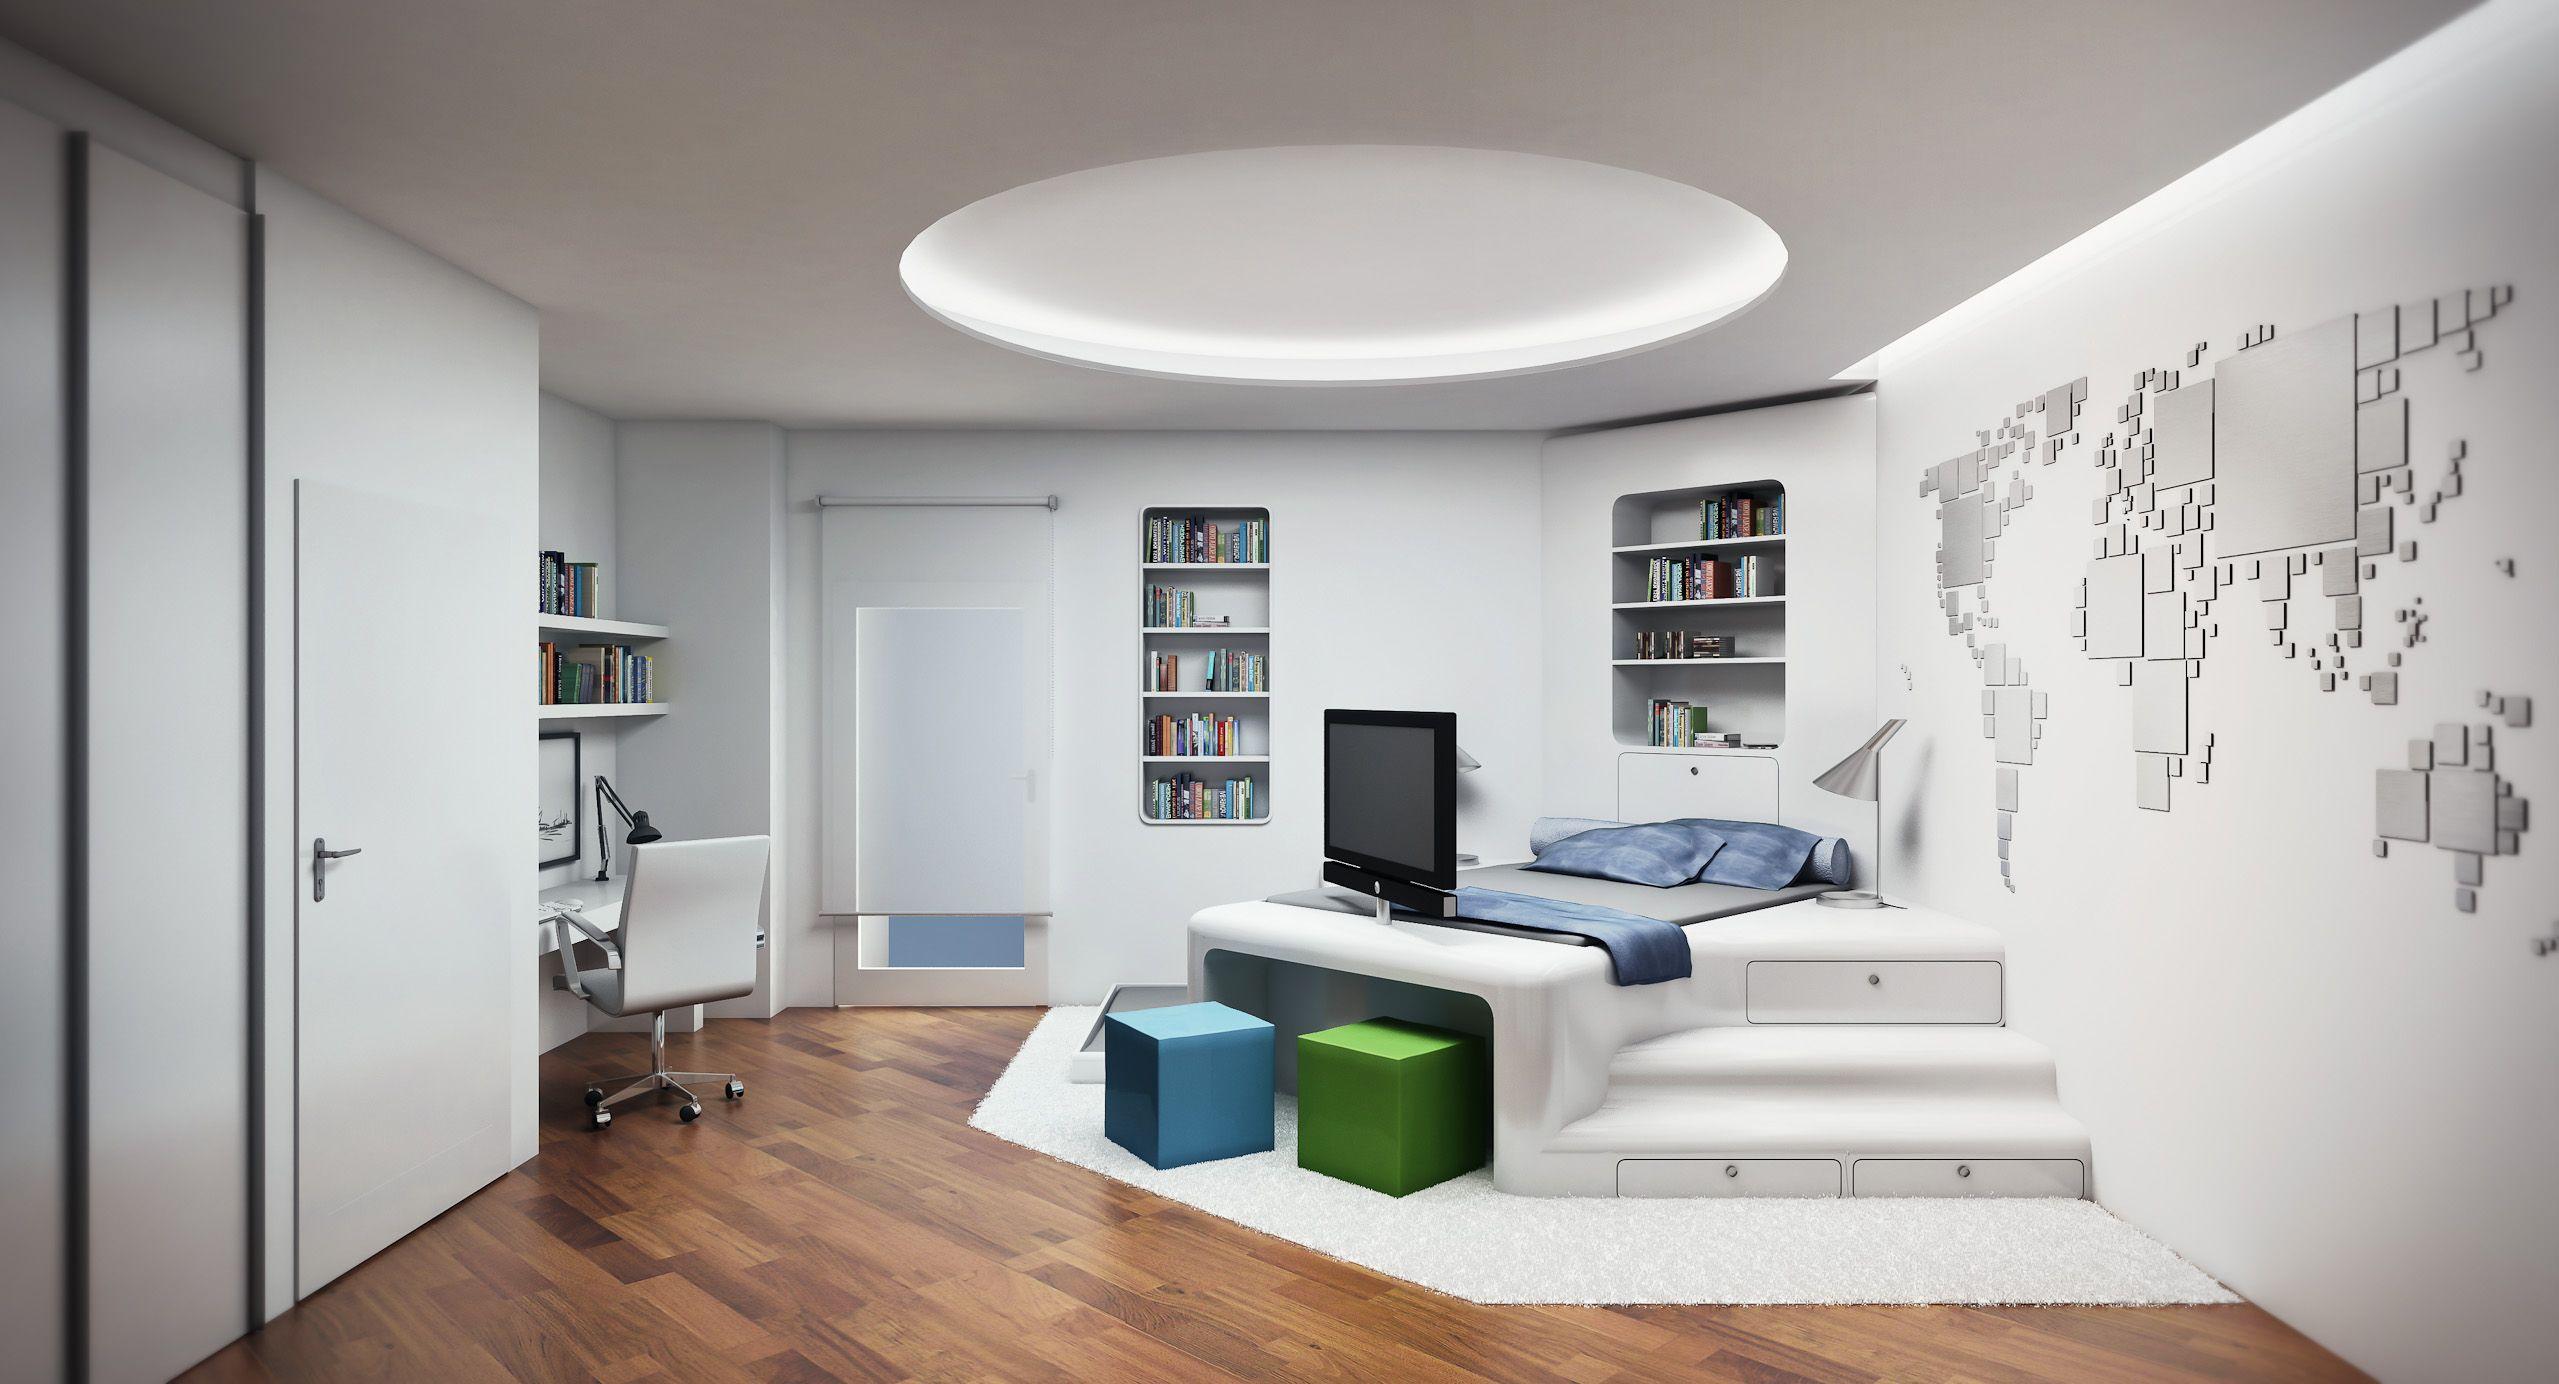 interior architectural designs interior architecture design